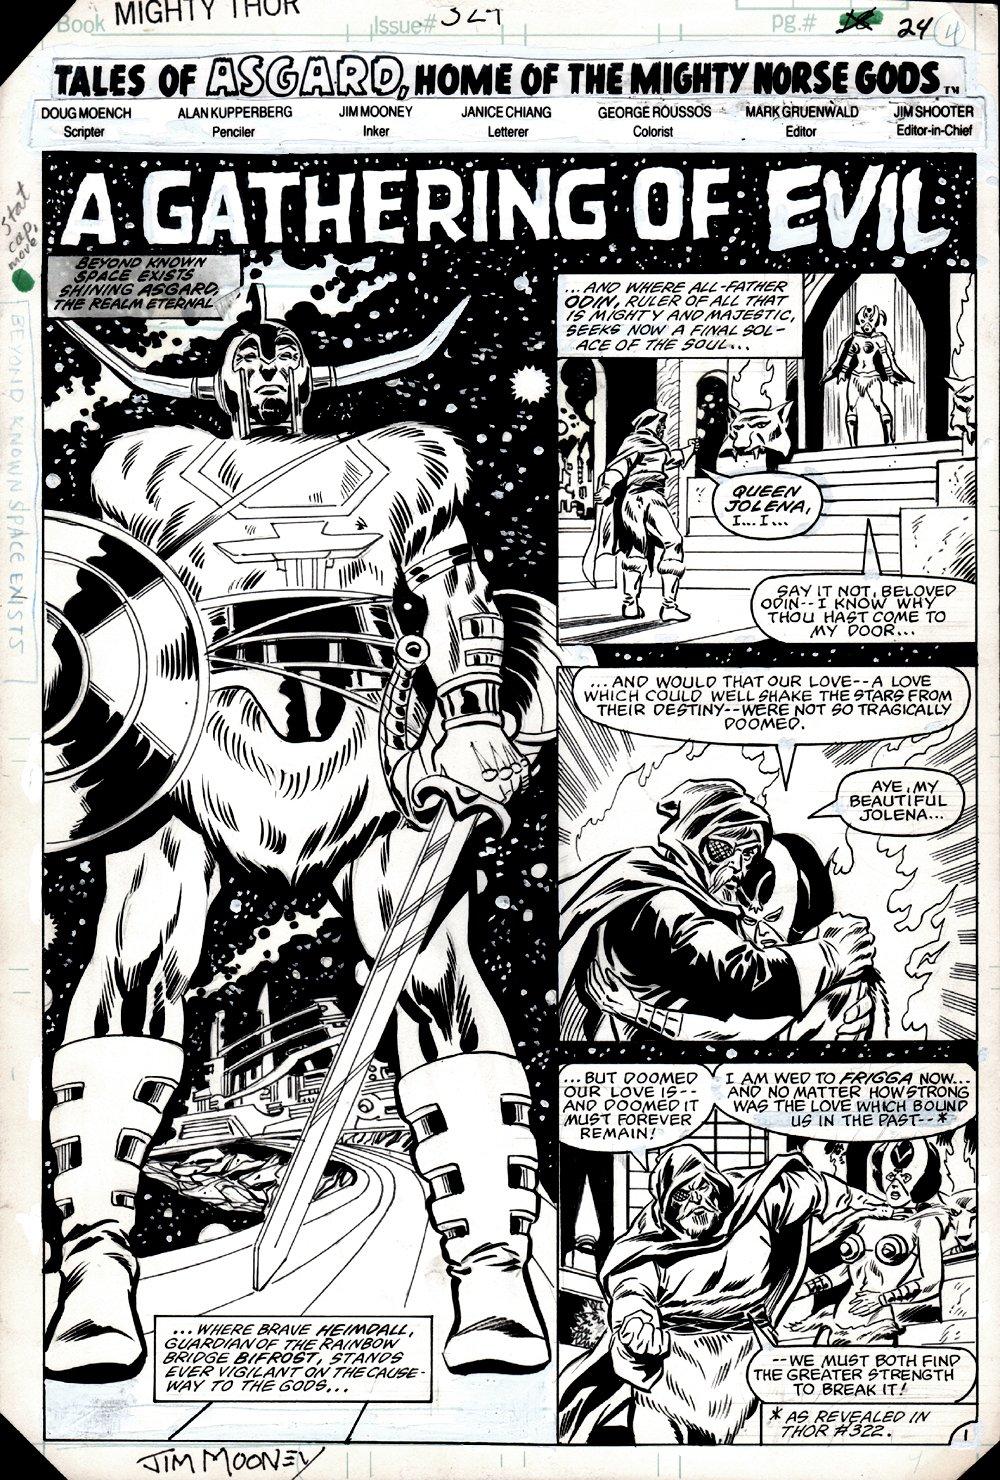 Thor #324 p 1 SPLASH (HEIMDALL ON THE RAINBOW BRIDGE GUARDING ASGARD, & ODIN!) 1982